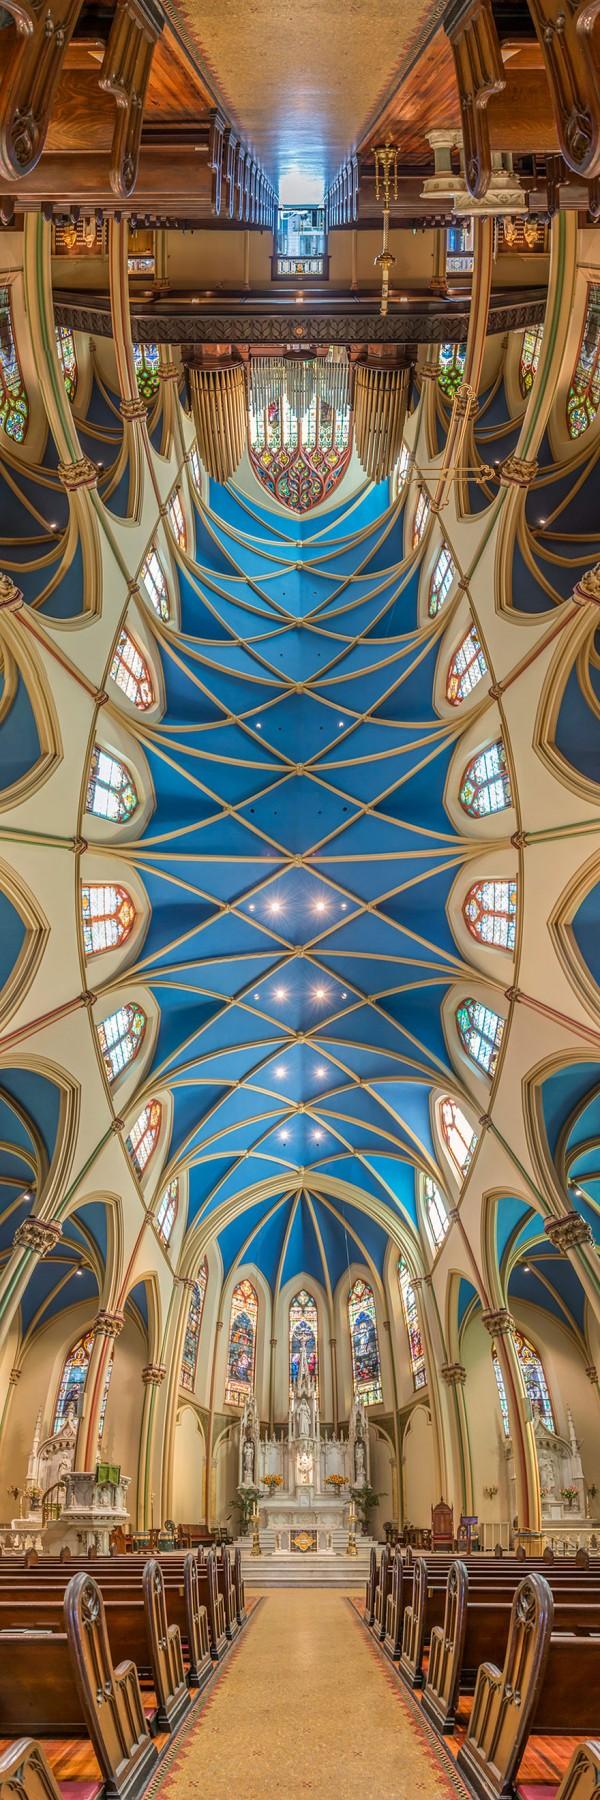 fotos-panoramicas-verticales-iglesias-nueva-york-richard-silver-1